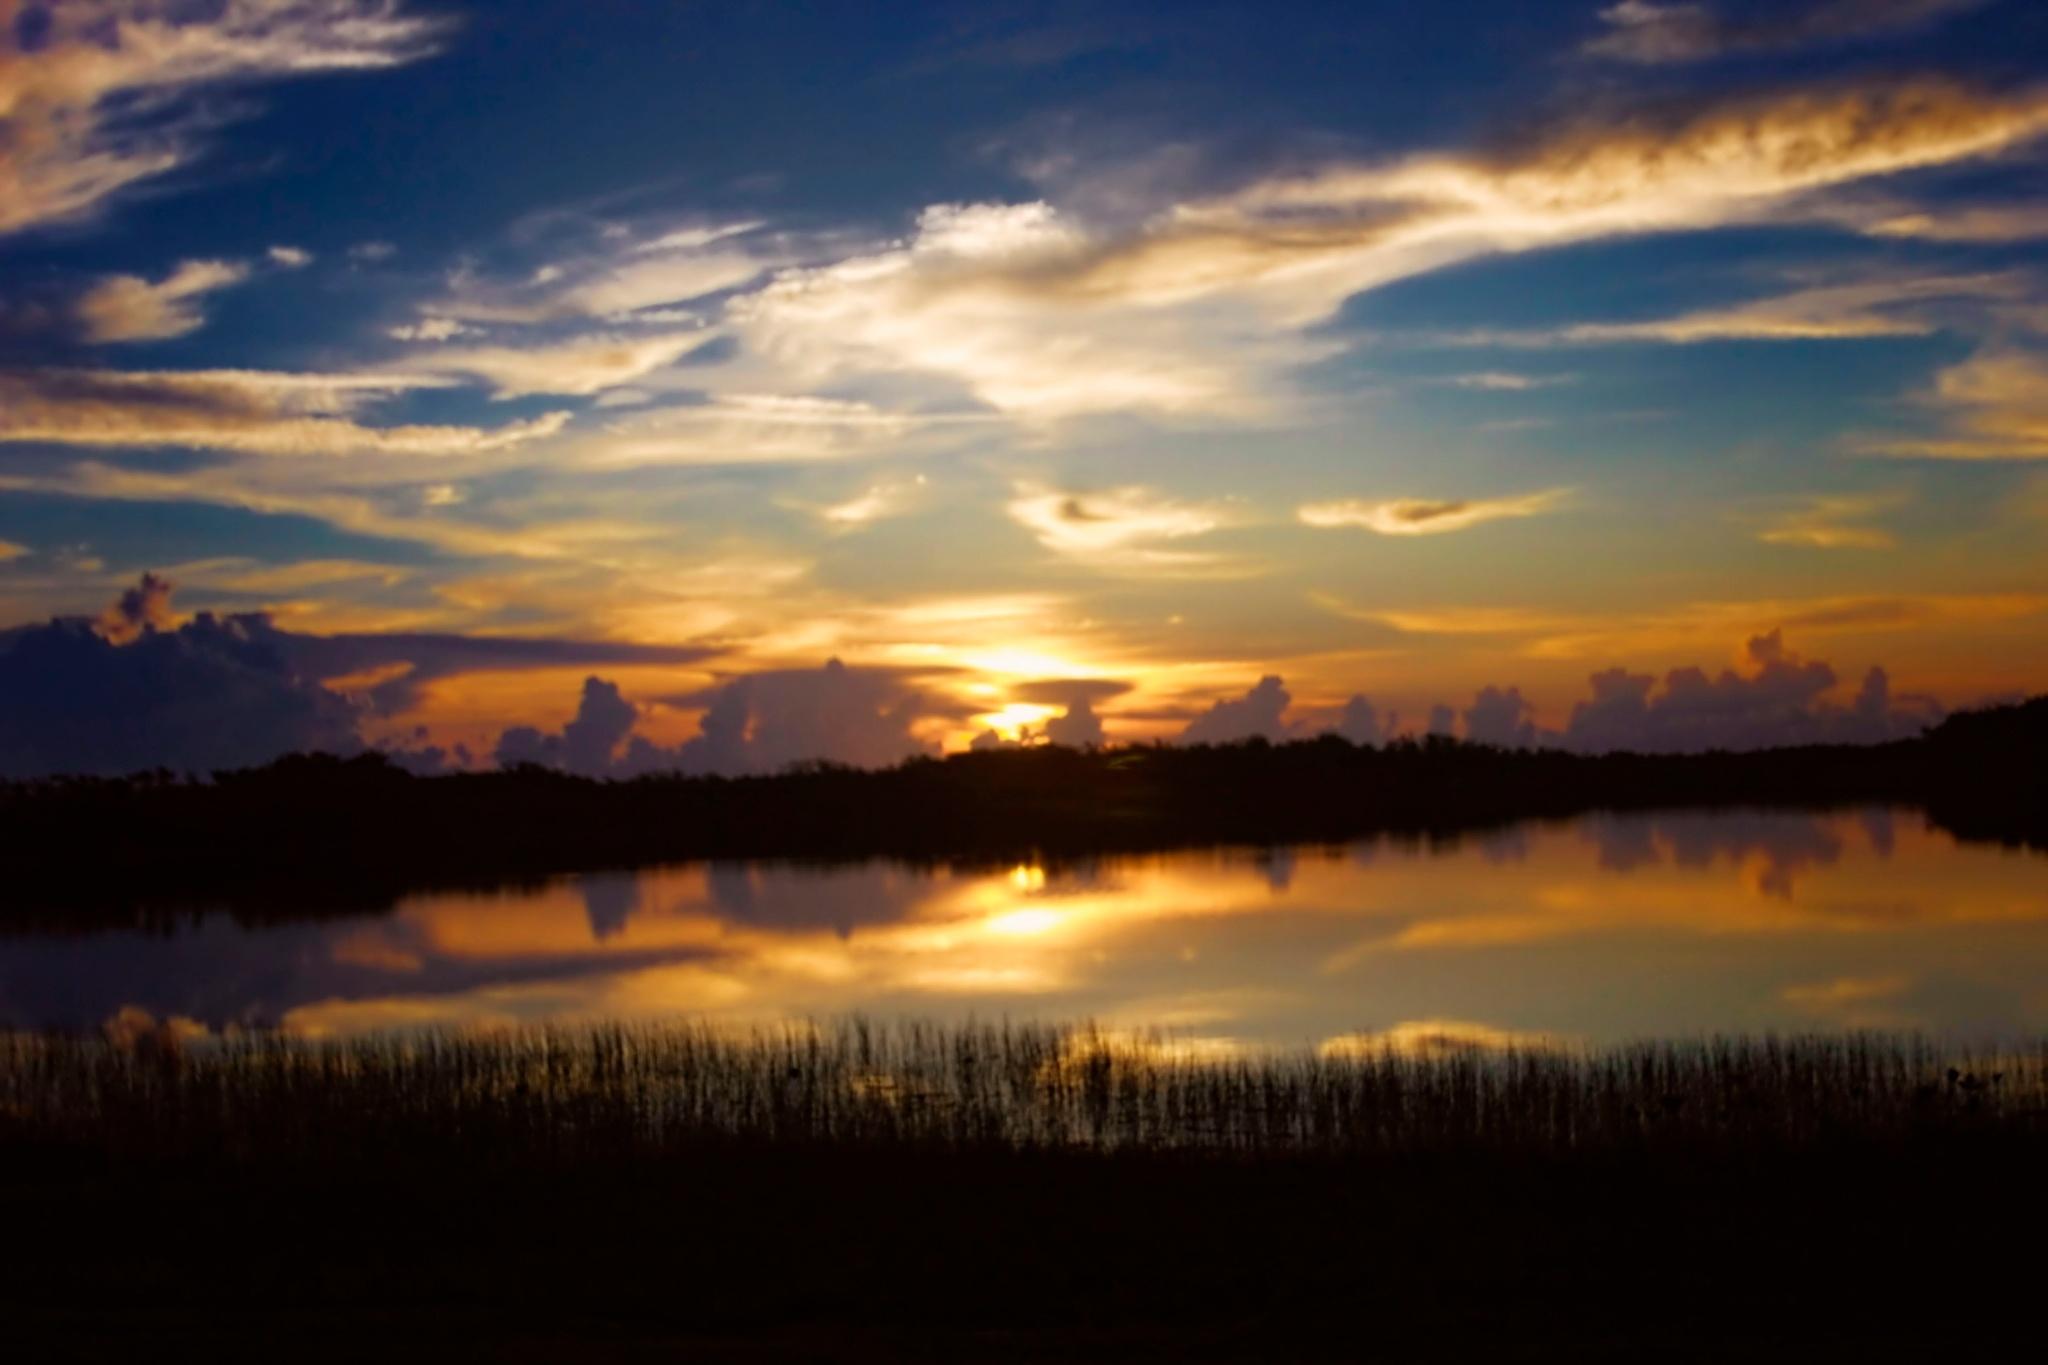 Everglades Sunrise by Mick Swengrosh